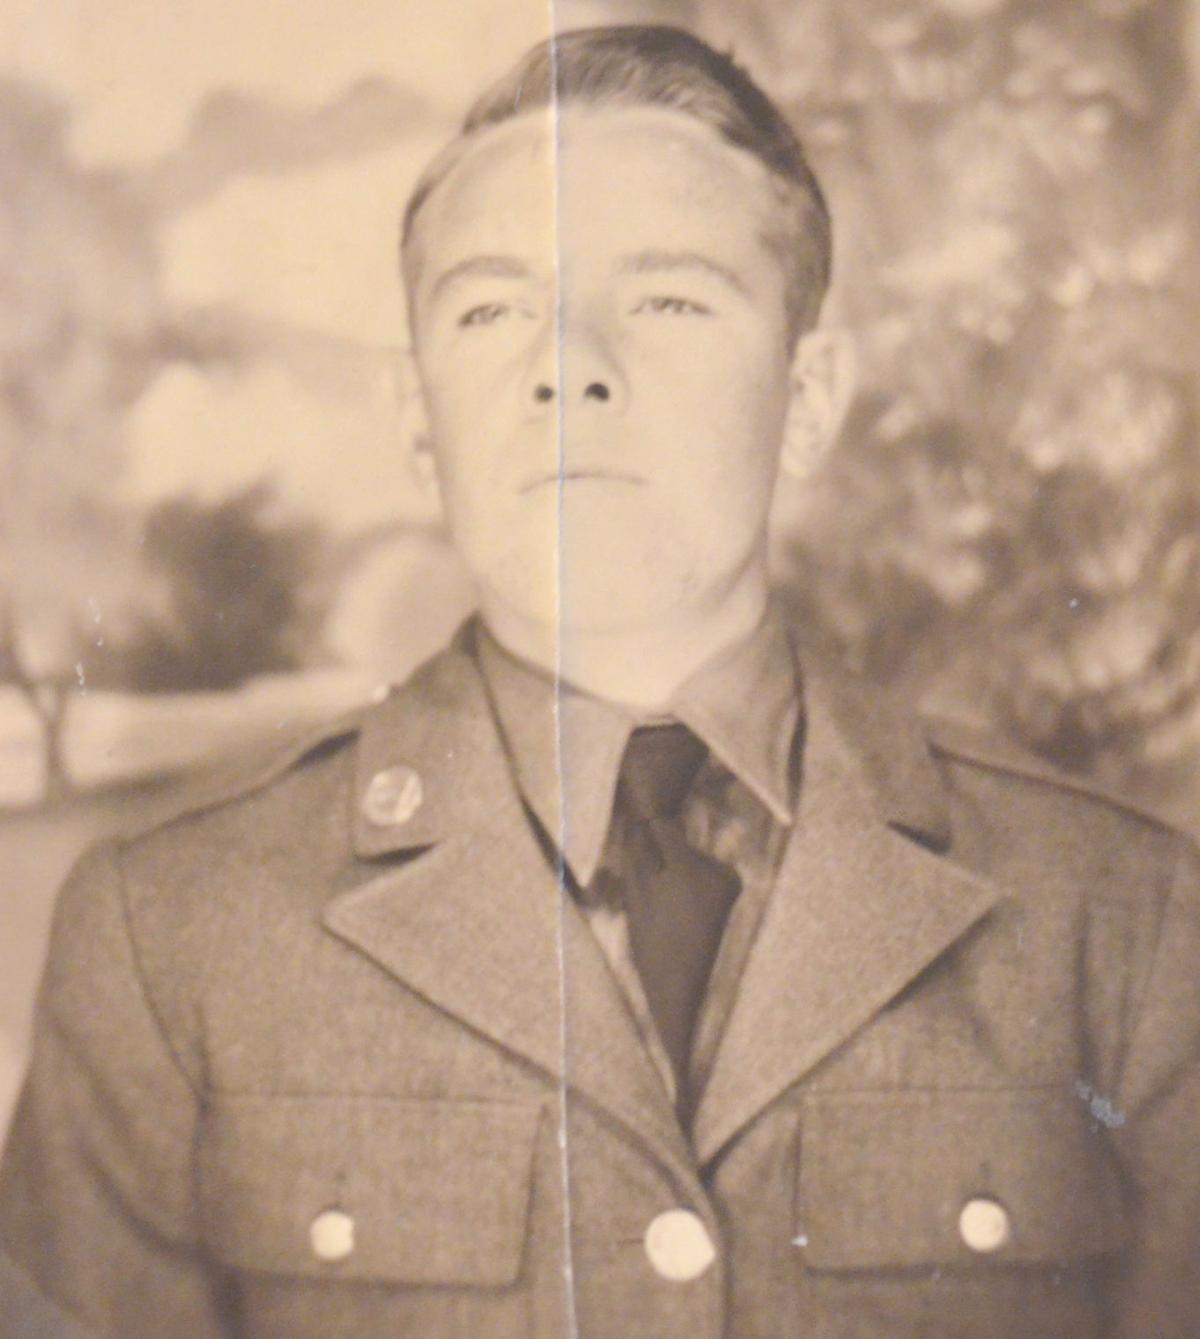 Arthur Ricker U.S. Army Photo